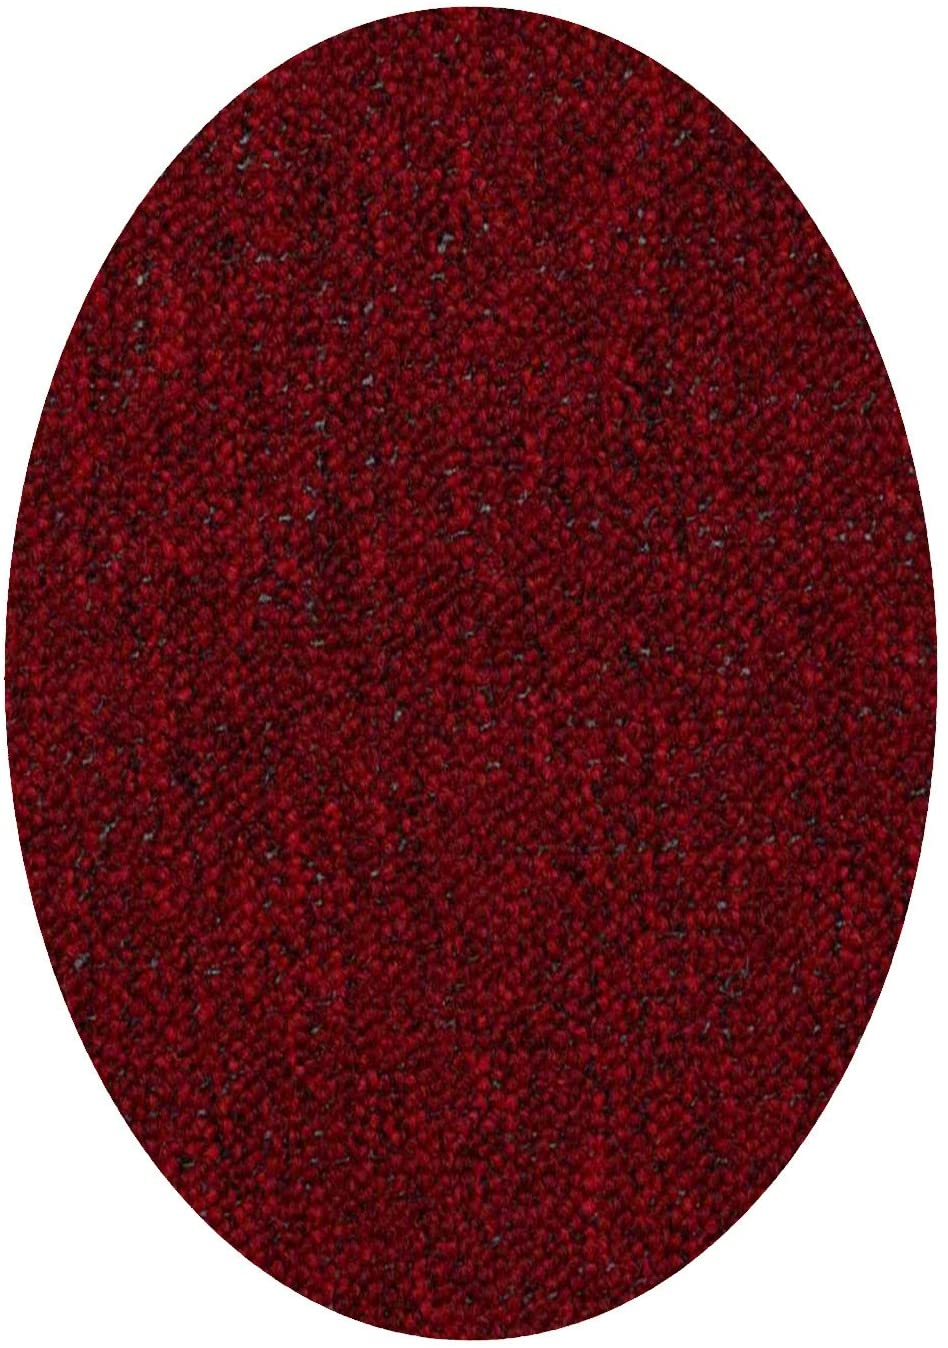 Home Queen IndoorOutdoor Commercial Red Color Area Rug - 1.5' x 2.25' Oval Mat